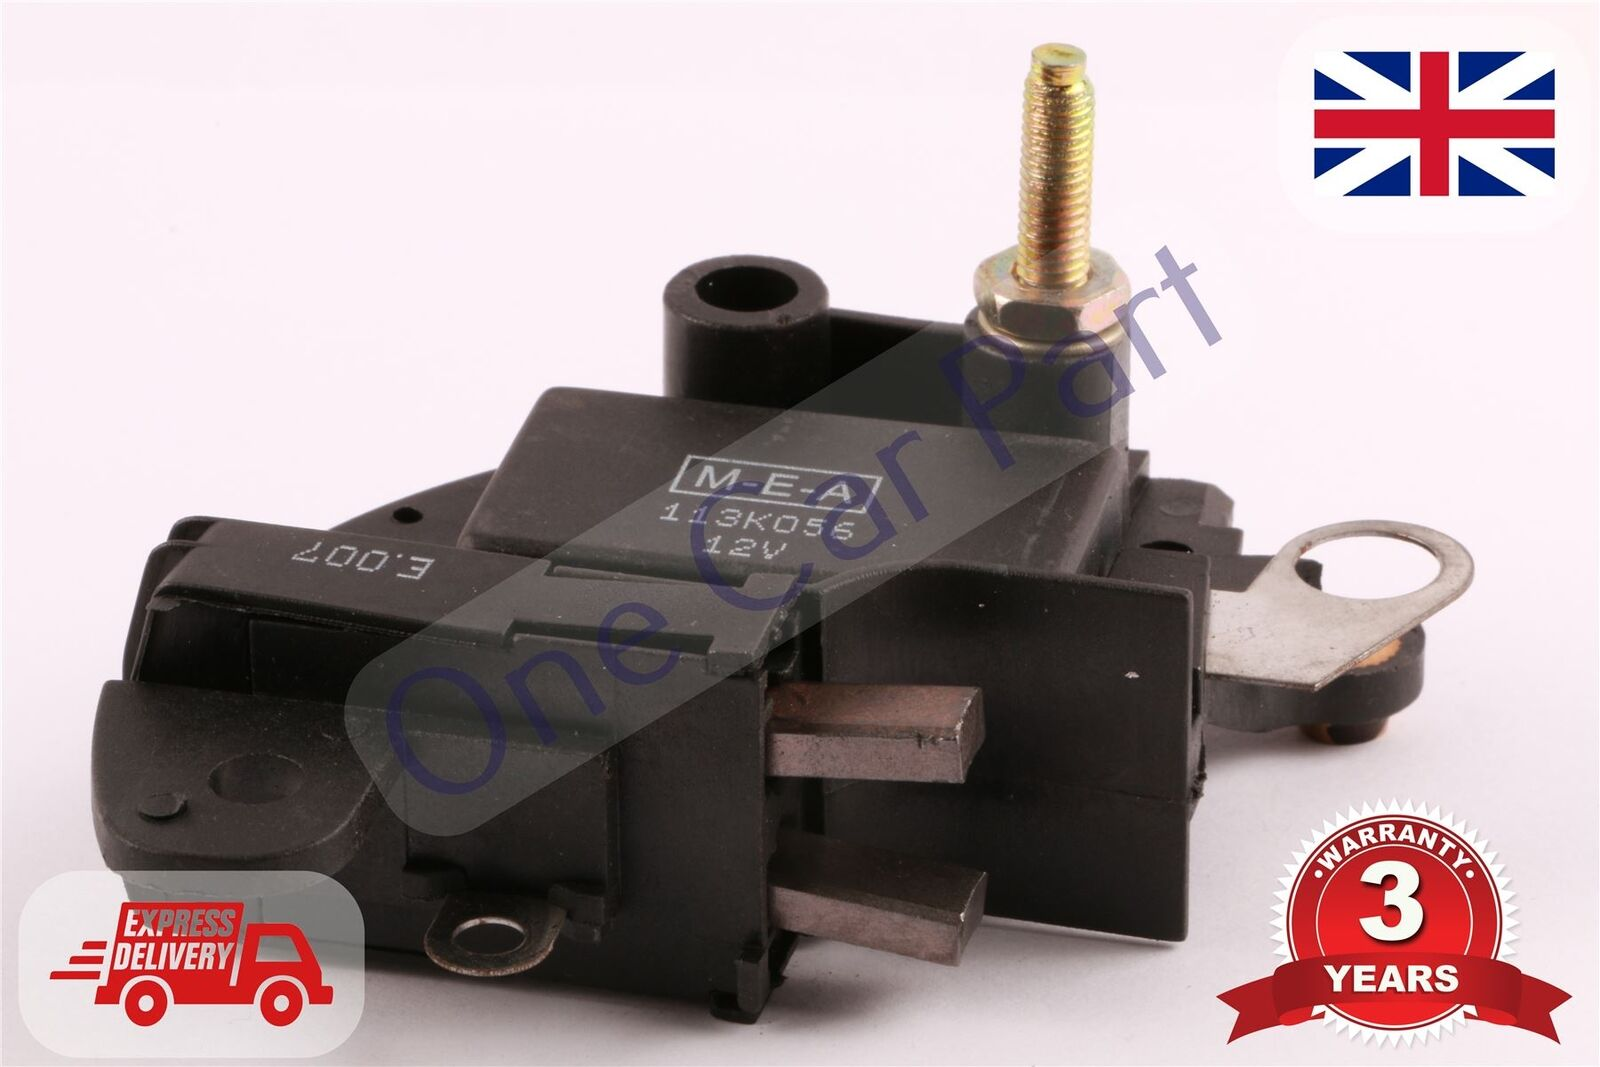 ALTERNATOR Regulator For MG MGF 1.8 ZR 105 ZR 160 1.8 ZS 110 1.6 Mini 1.3 IX121